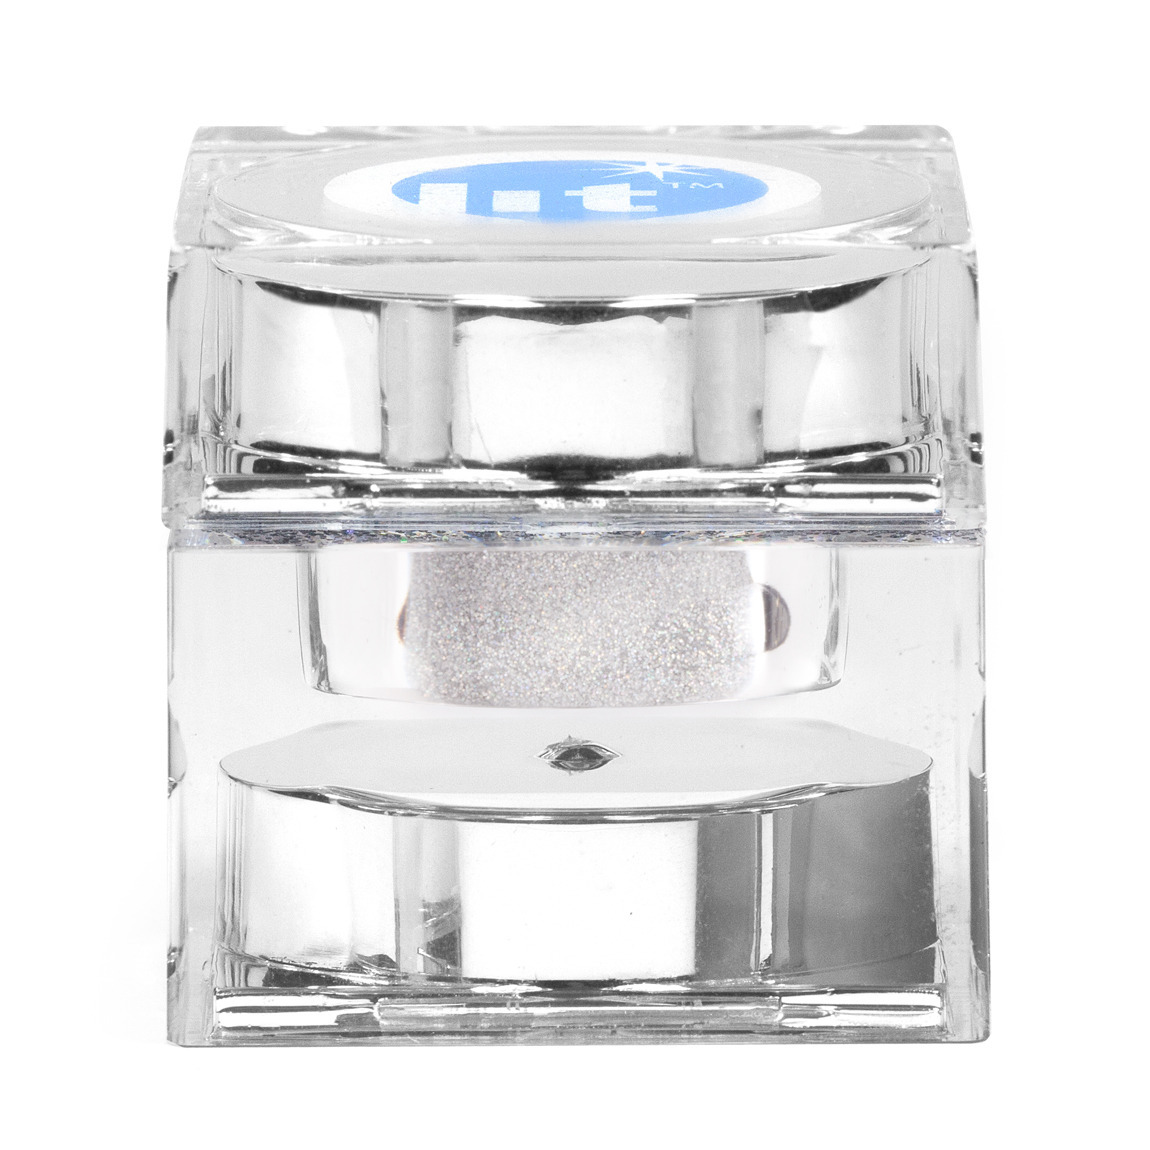 Lit Cosmetics Lit Glitter Cher S2 (Holographic) alternative view 1.